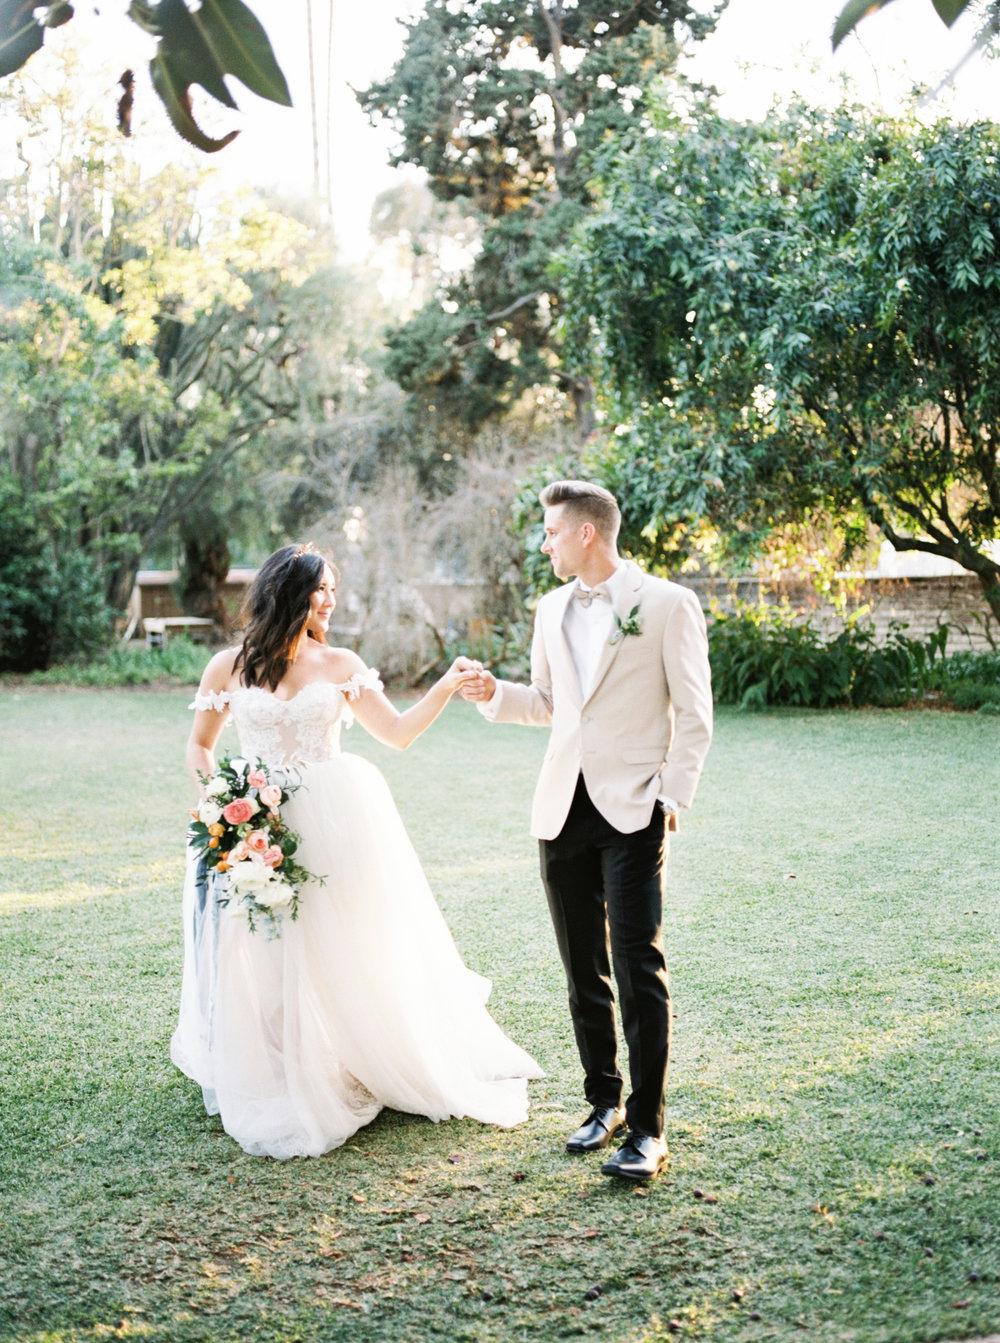 simply-brigadeiro-rancho-los-cerrios-wedding-inspired-by-this-sisterlee-photography-4.jpg